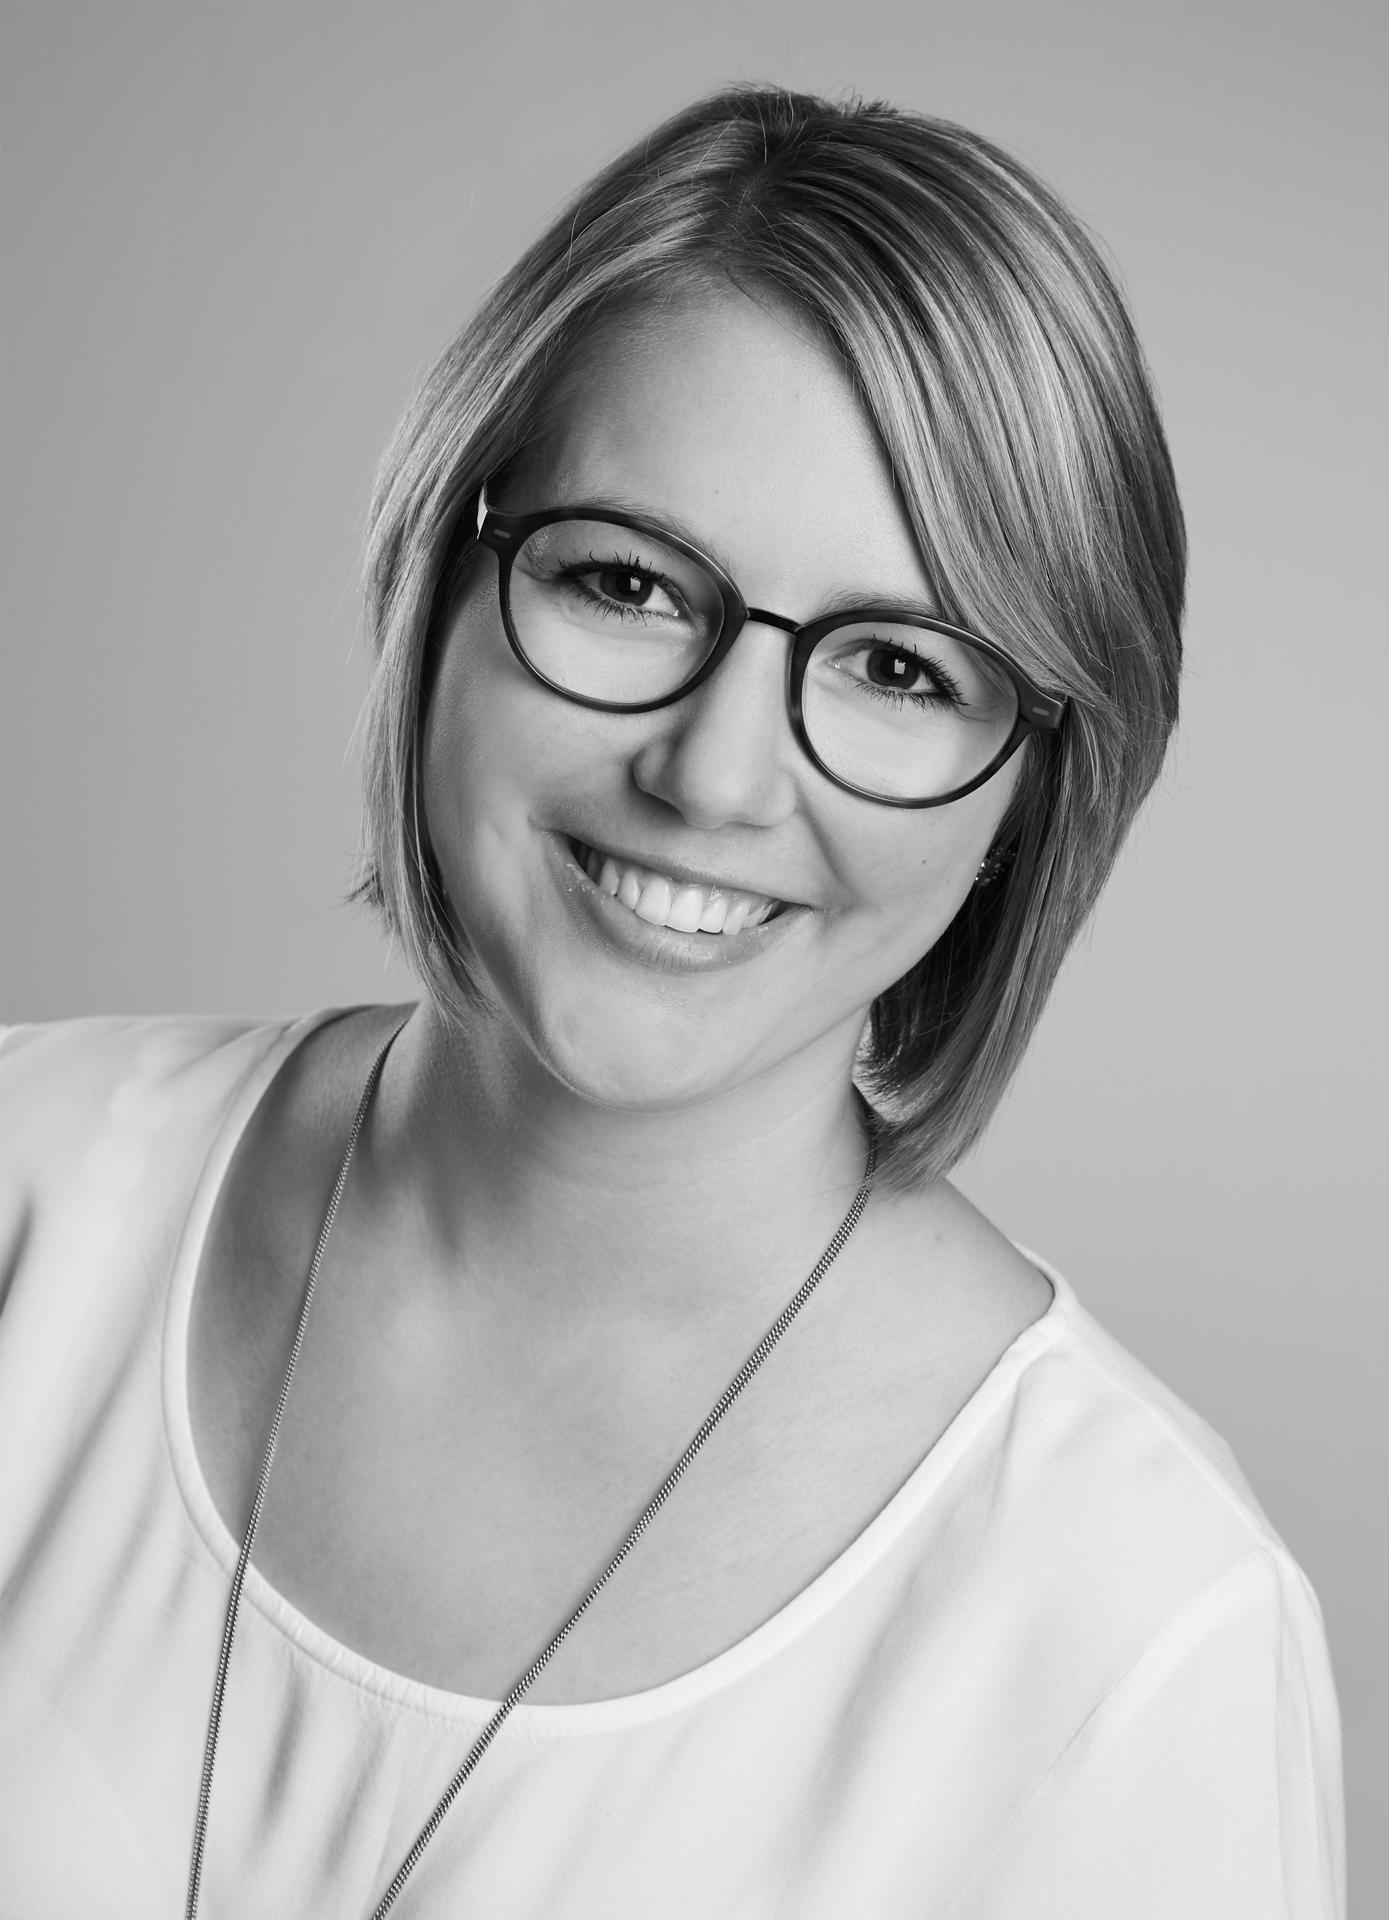 Johanna Schmitz